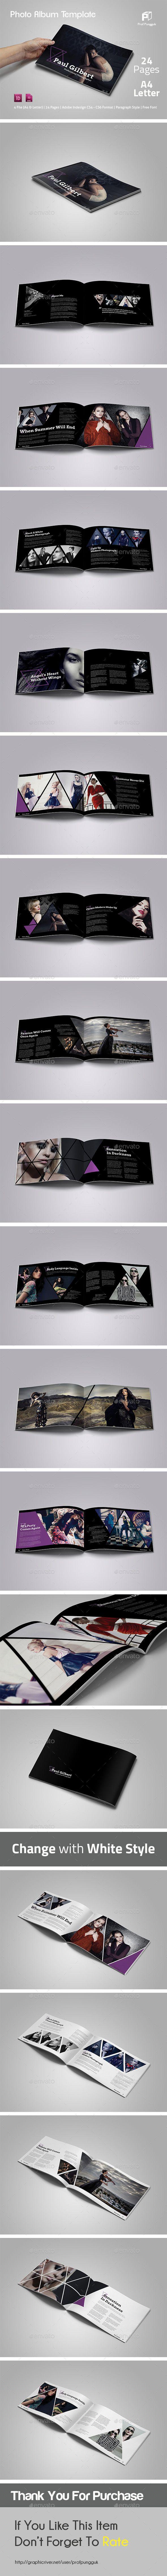 Modern Photo Album Template #design Download: http://graphicriver.net/item/modern-photo-album-vol-2/12434718?ref=ksioks